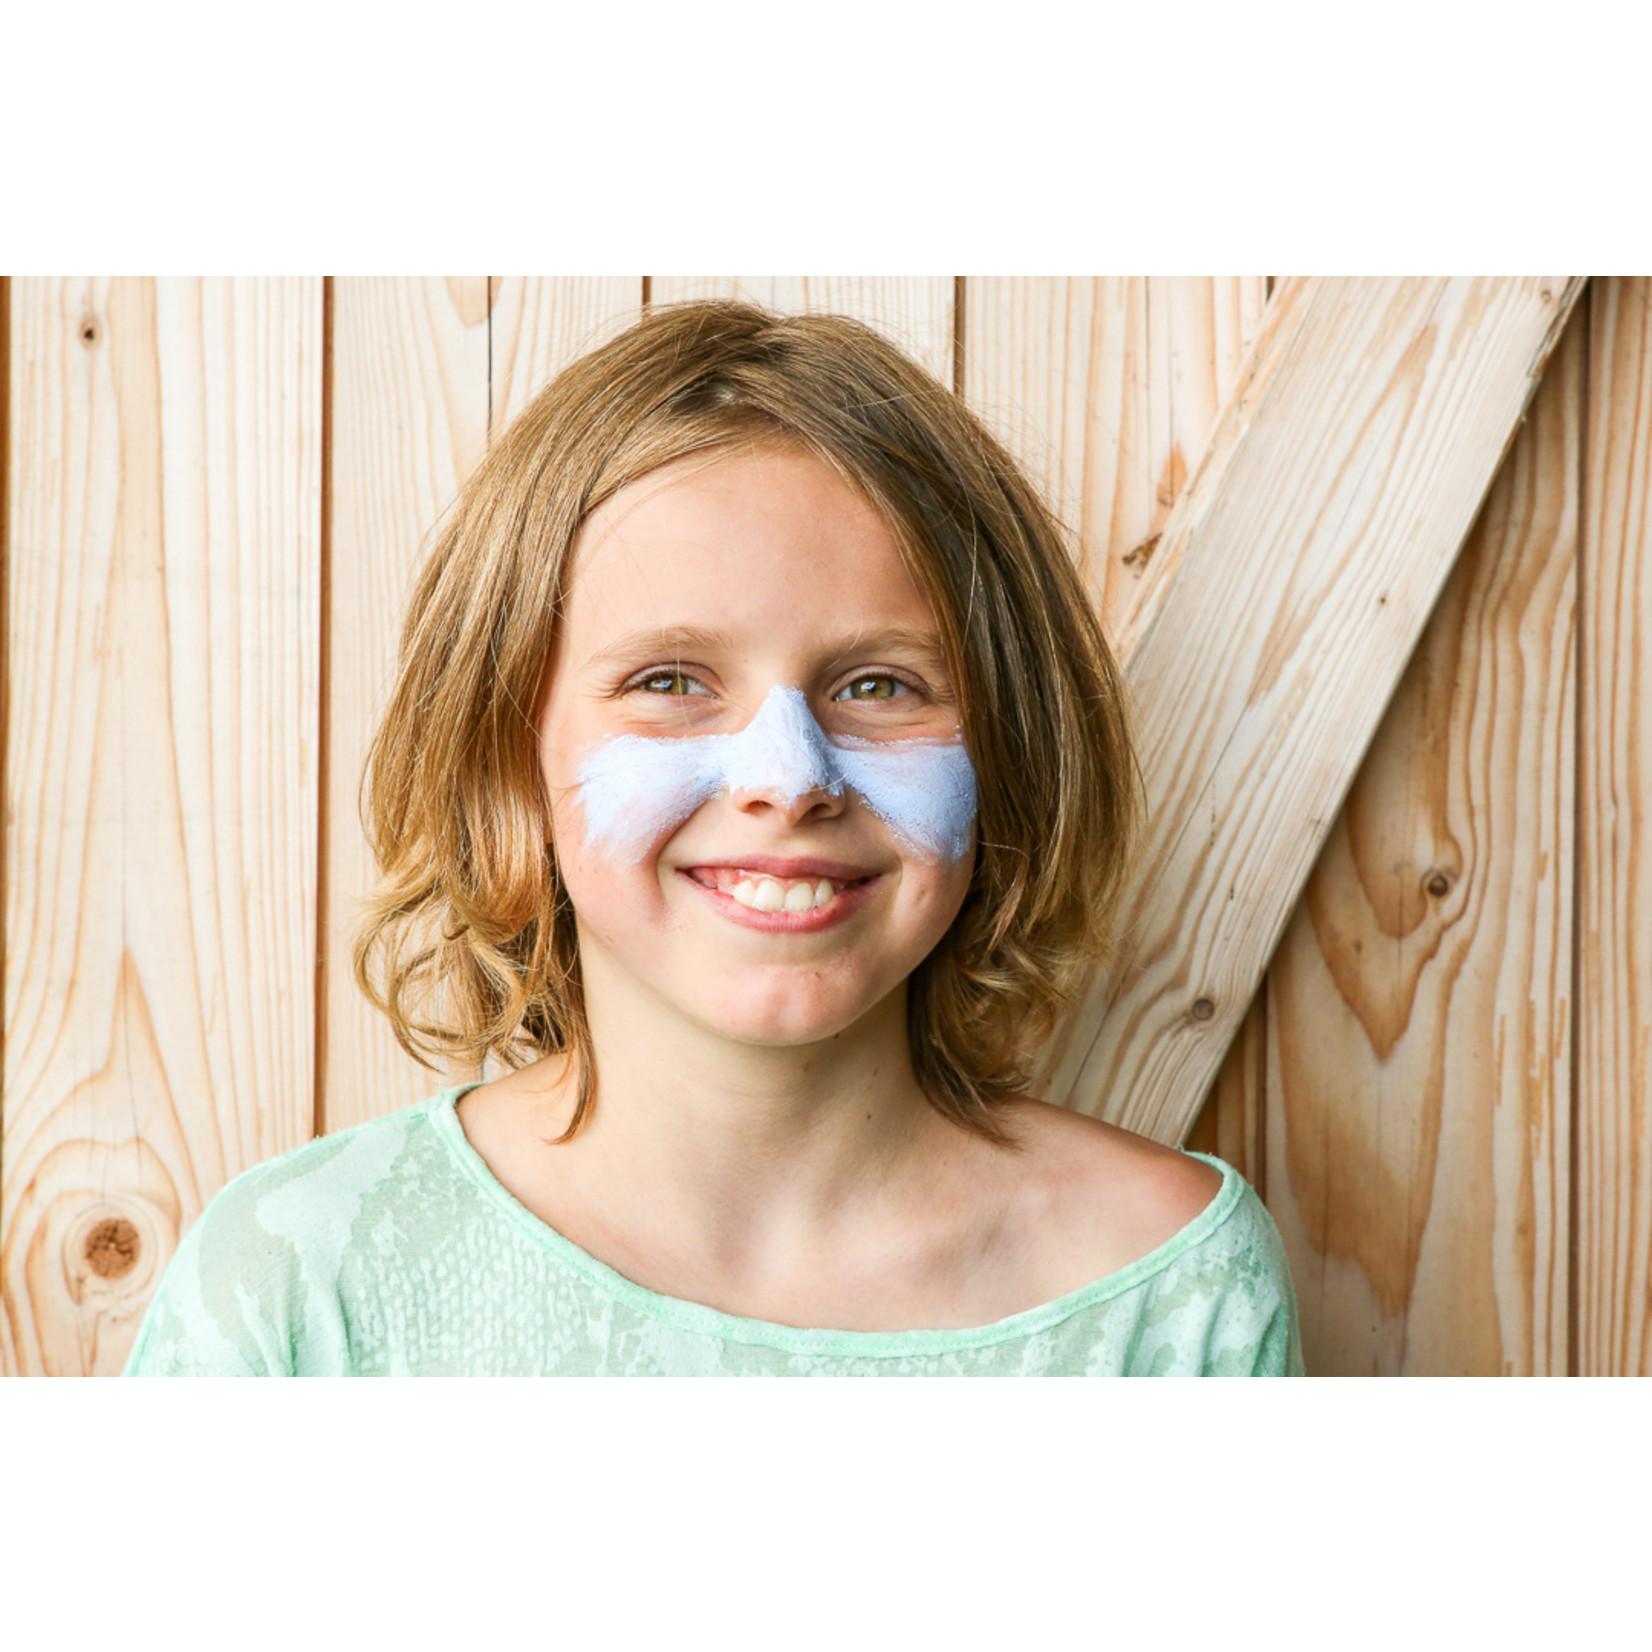 Suntribe Suntribe Zinc Sunscreen Tinted - Retro Blue - SPF30